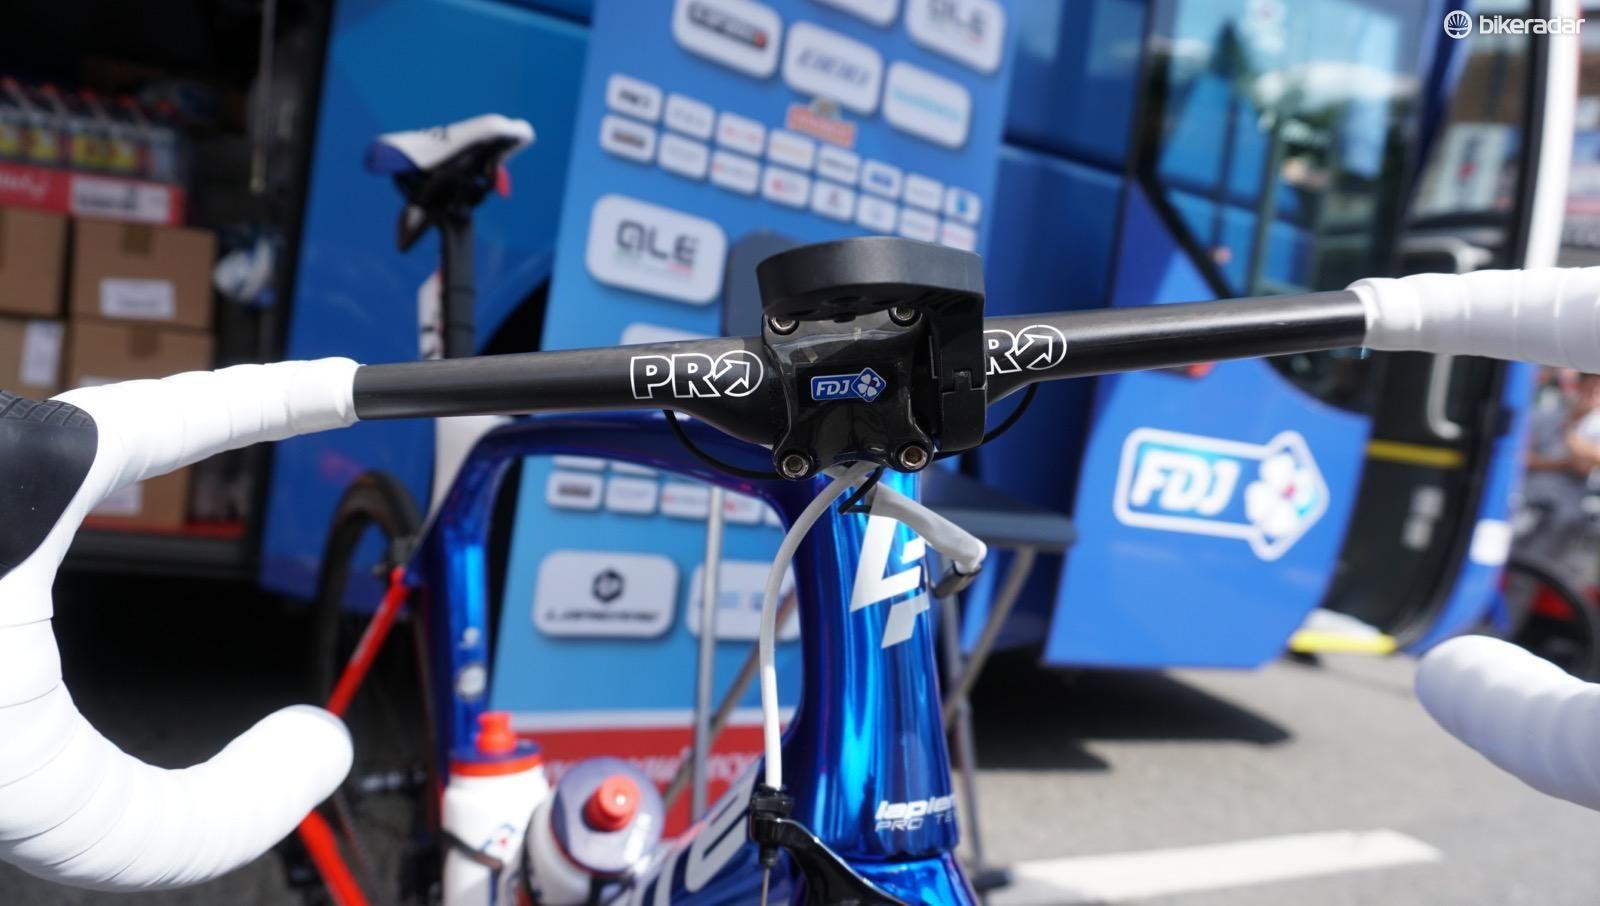 Demare Wins Tour Stage On New Pro Vibe Aero Bar Tour De France Tours Vibes